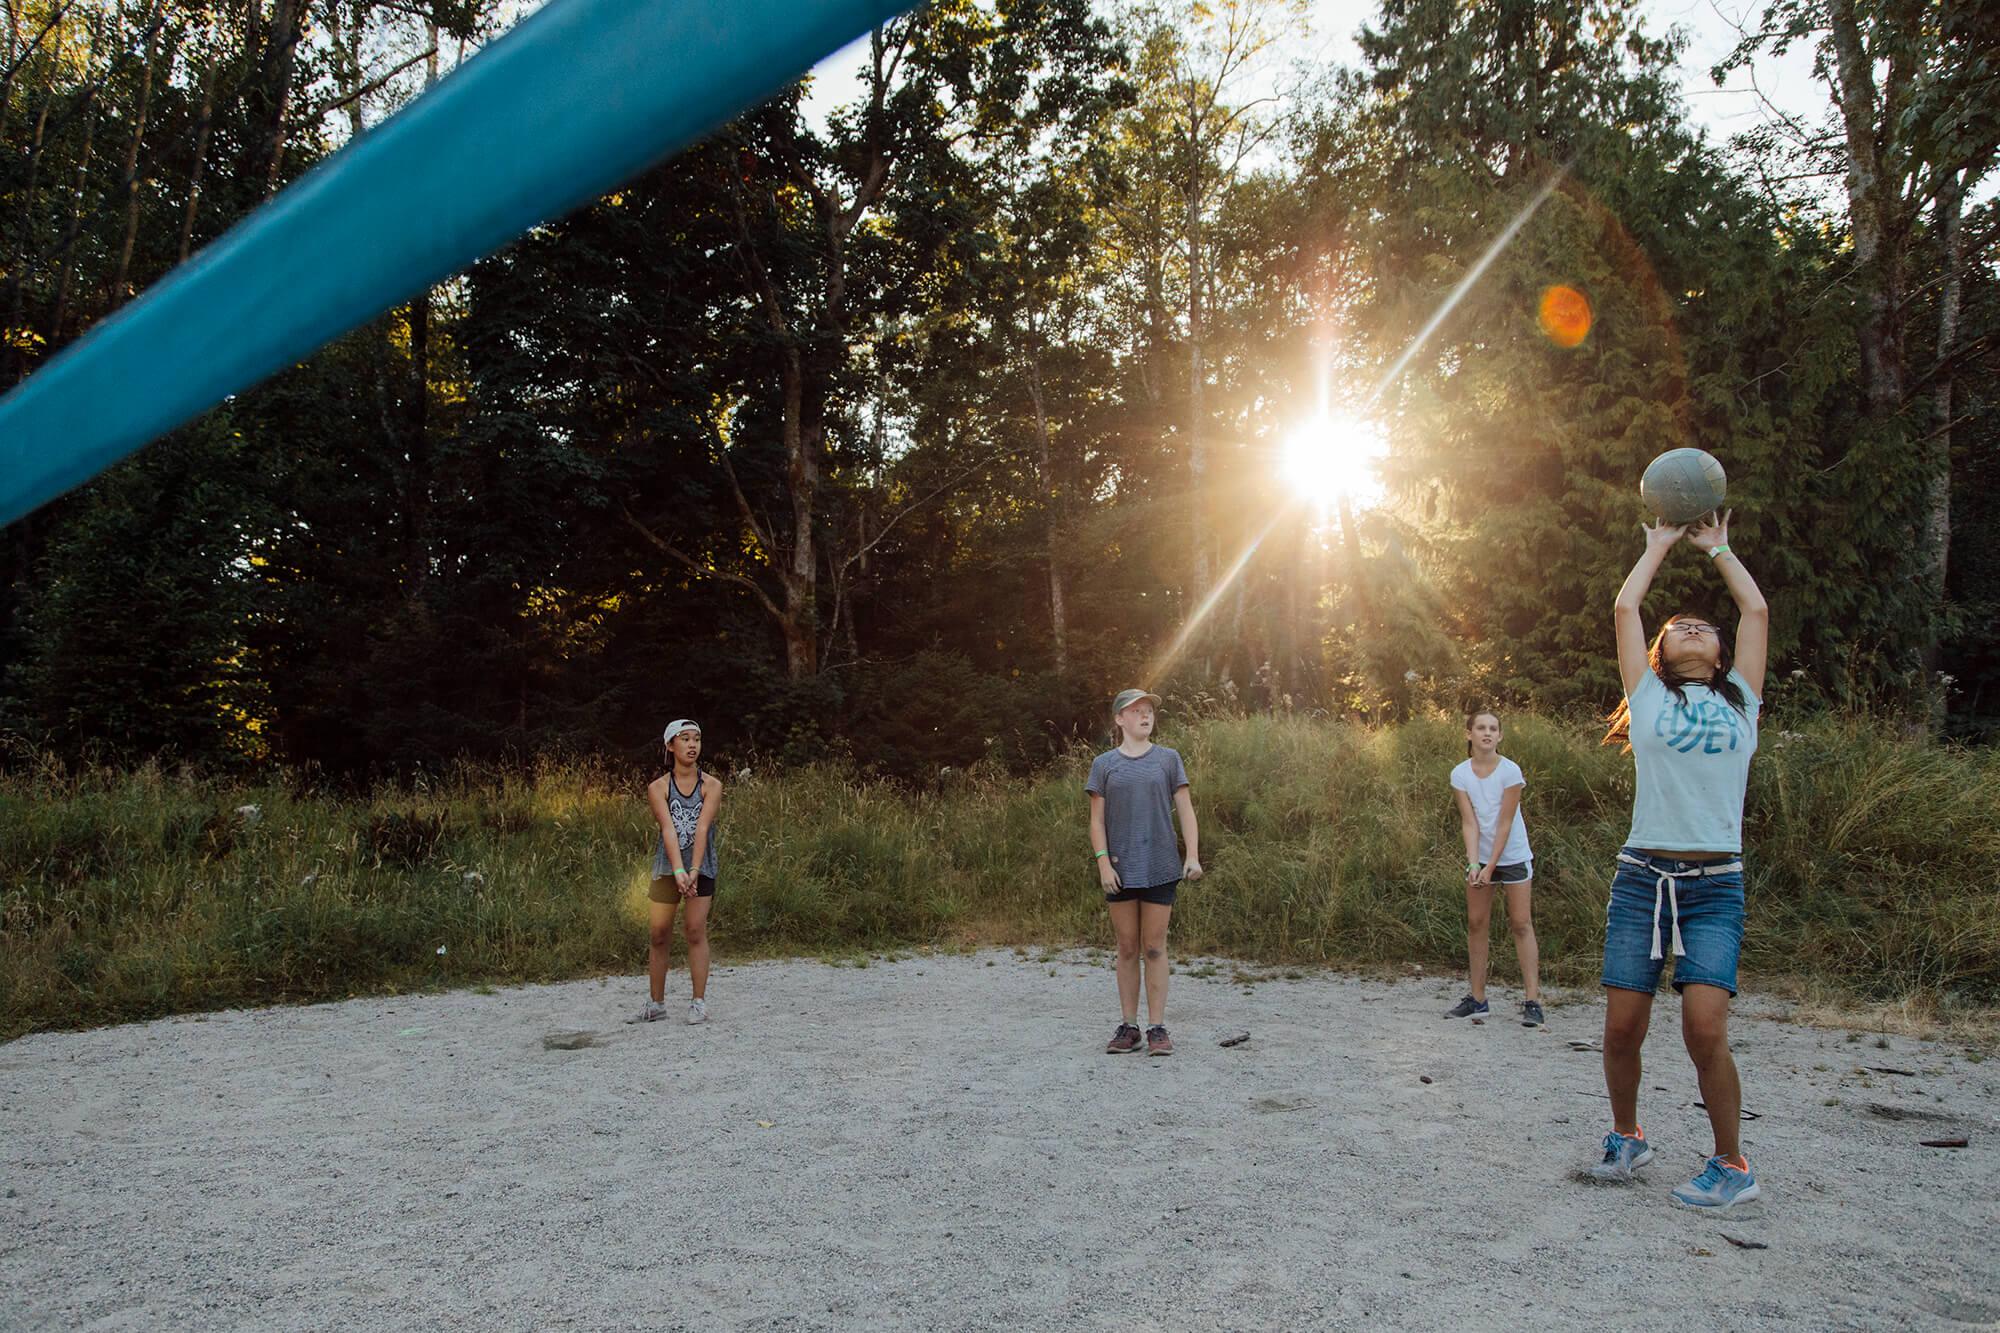 Activities_Volleyball.jpg